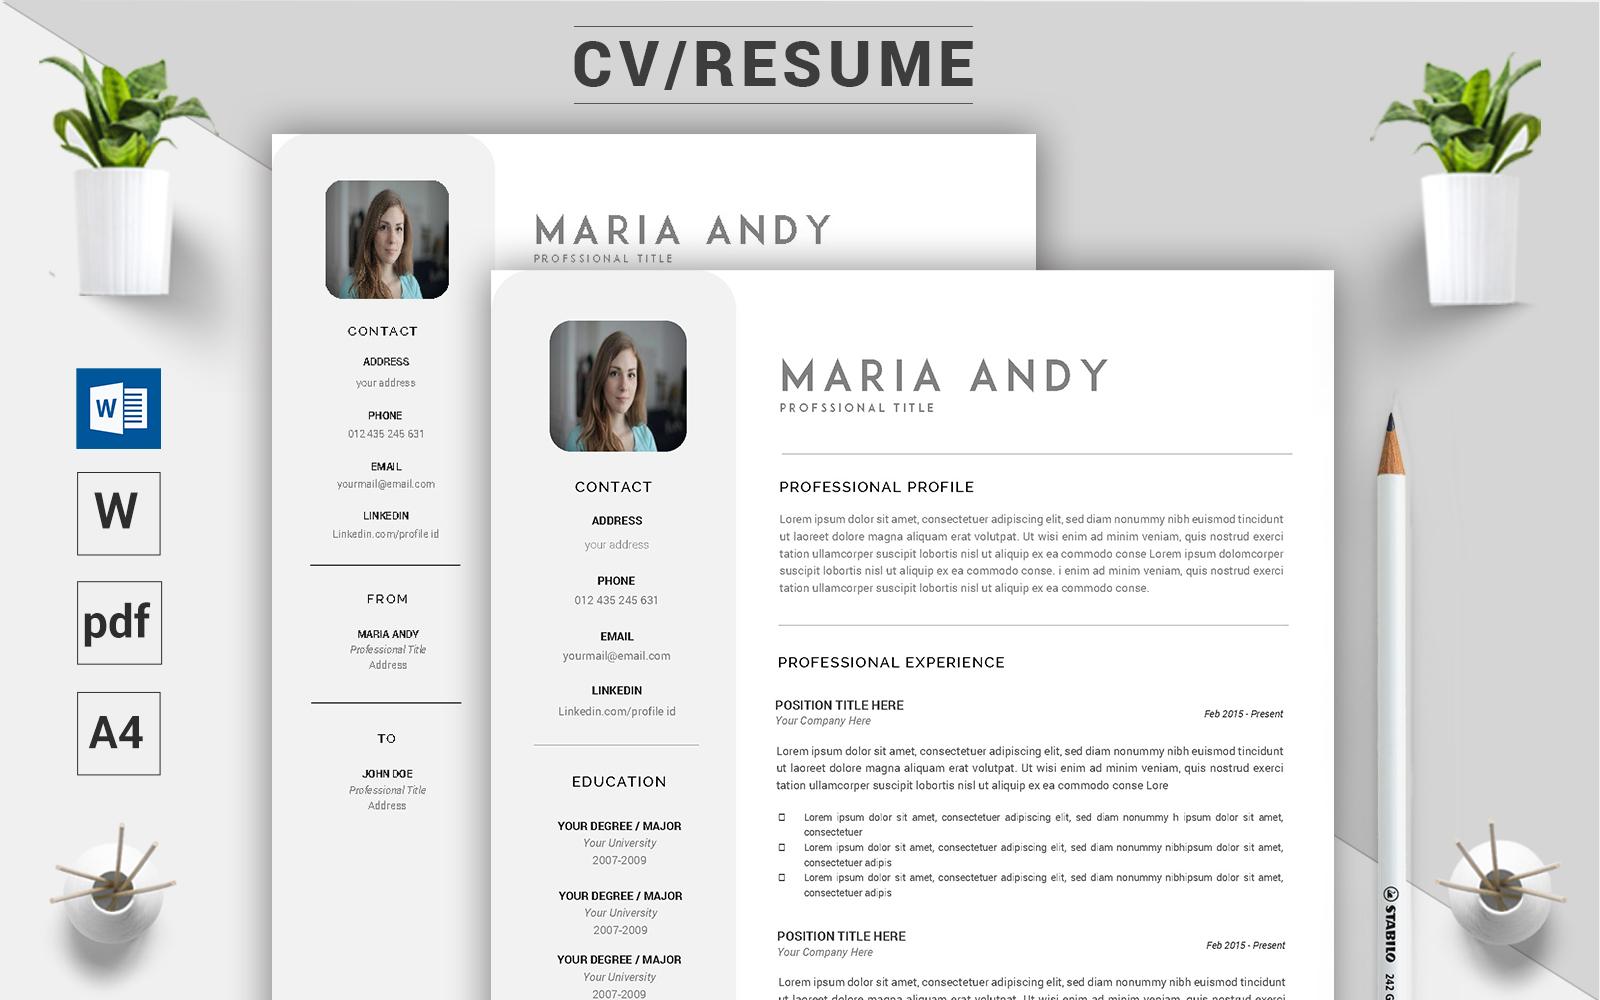 Maria Andy - CV Resume Template